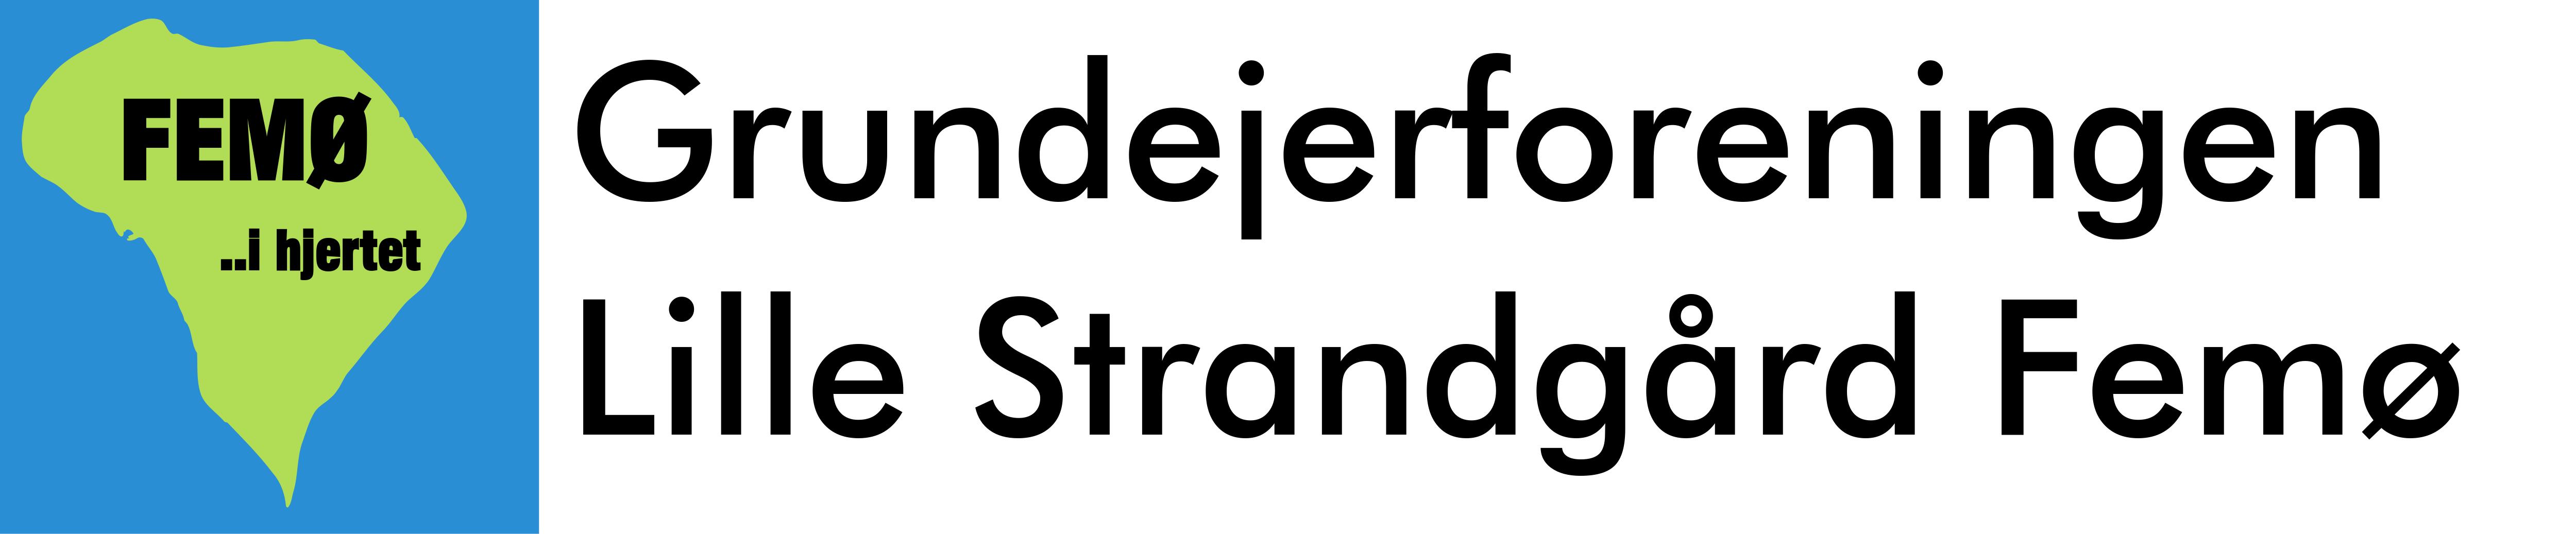 G/F Lille Strandgård Femø